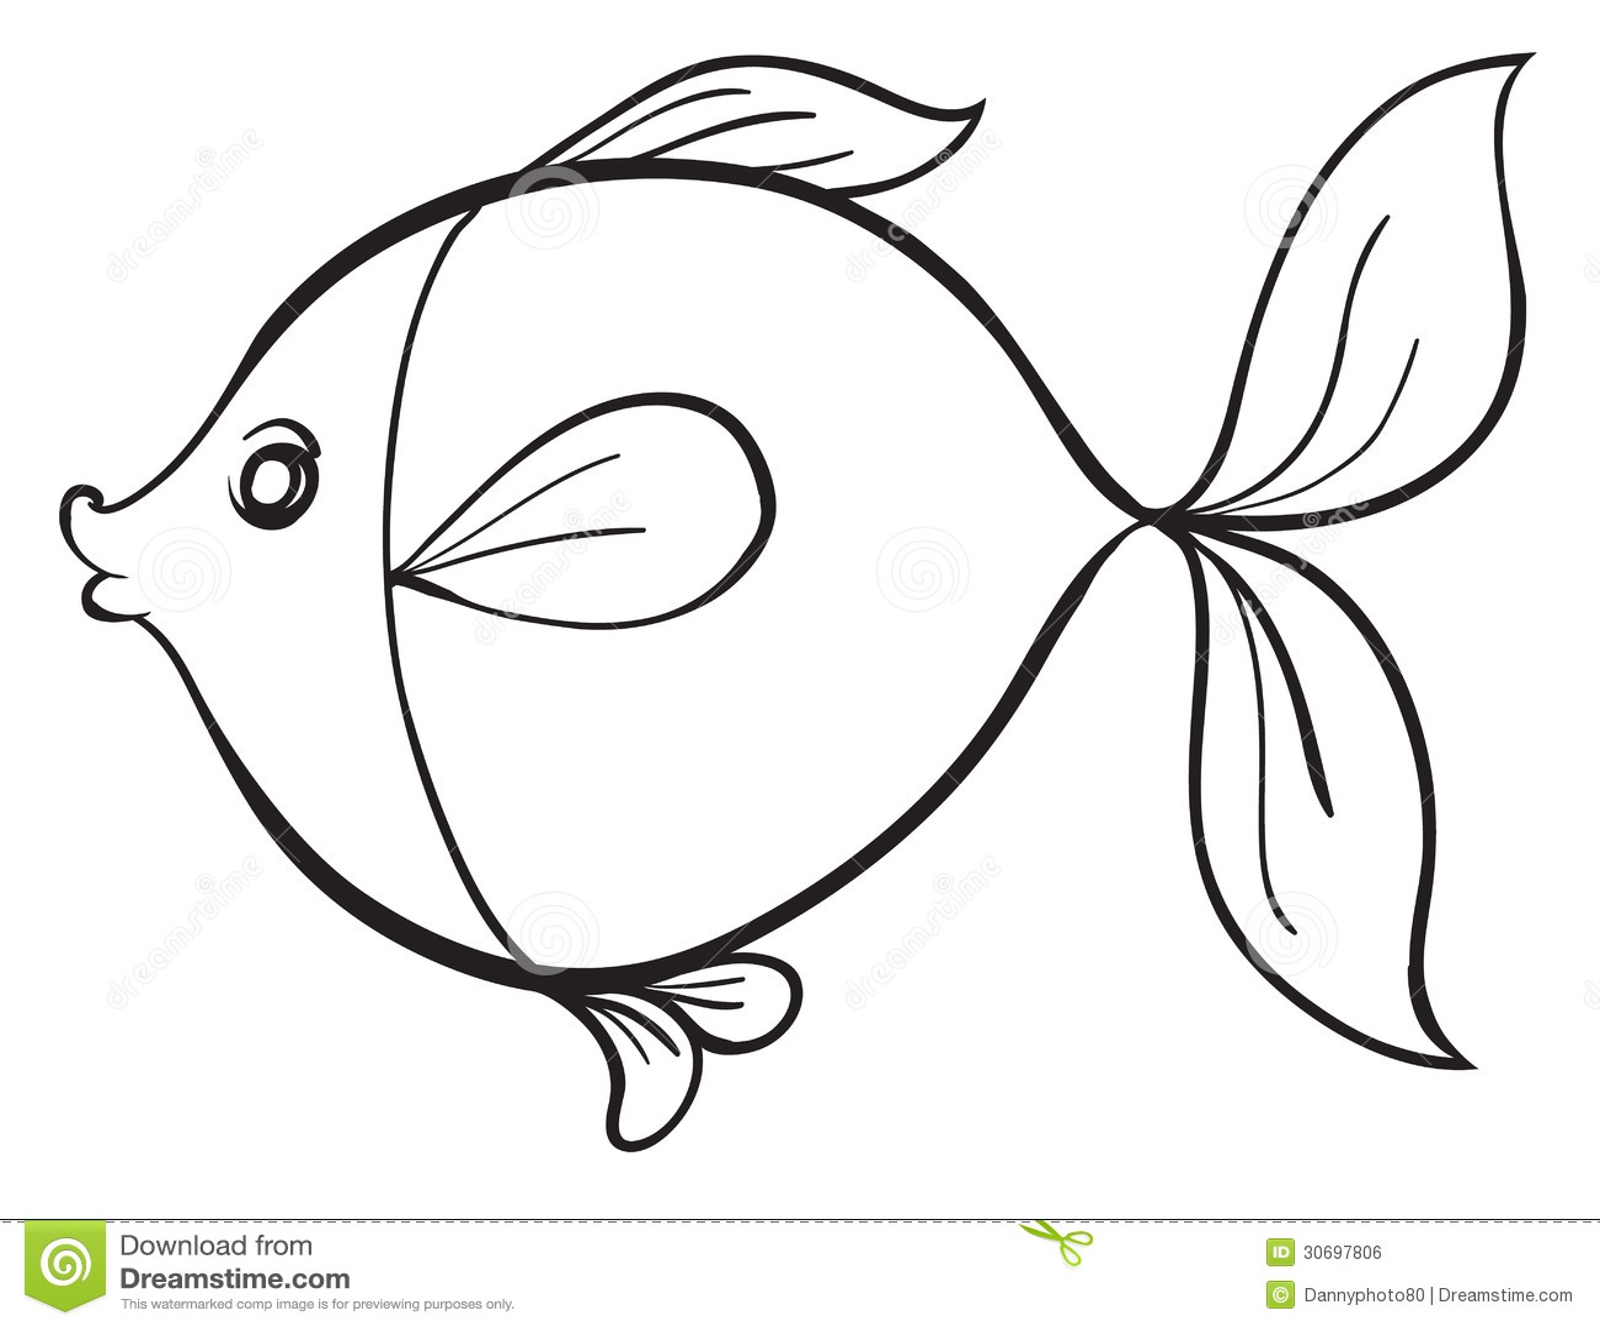 Line Art Of Fish : Fish royalty free stock image